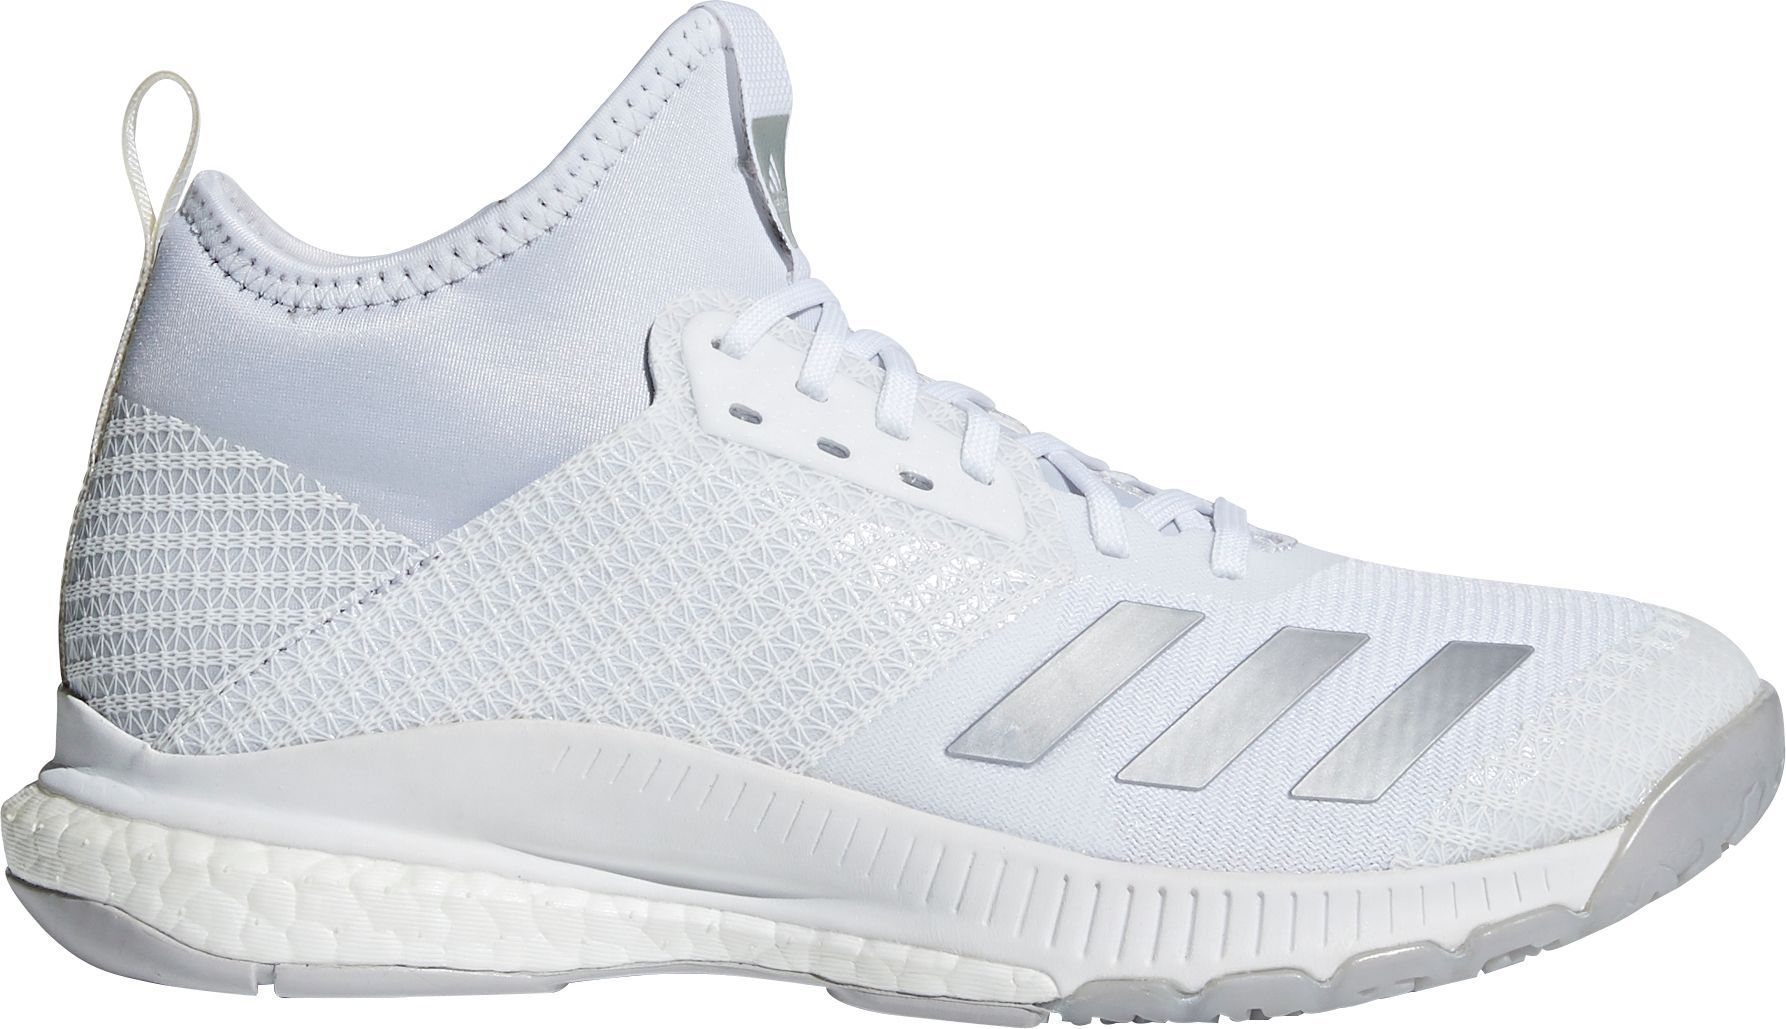 Adidas Women S Crazyflight X Mid Volleyball Shoes Volleyball Shoes Adidas White Shoes Adidas Women